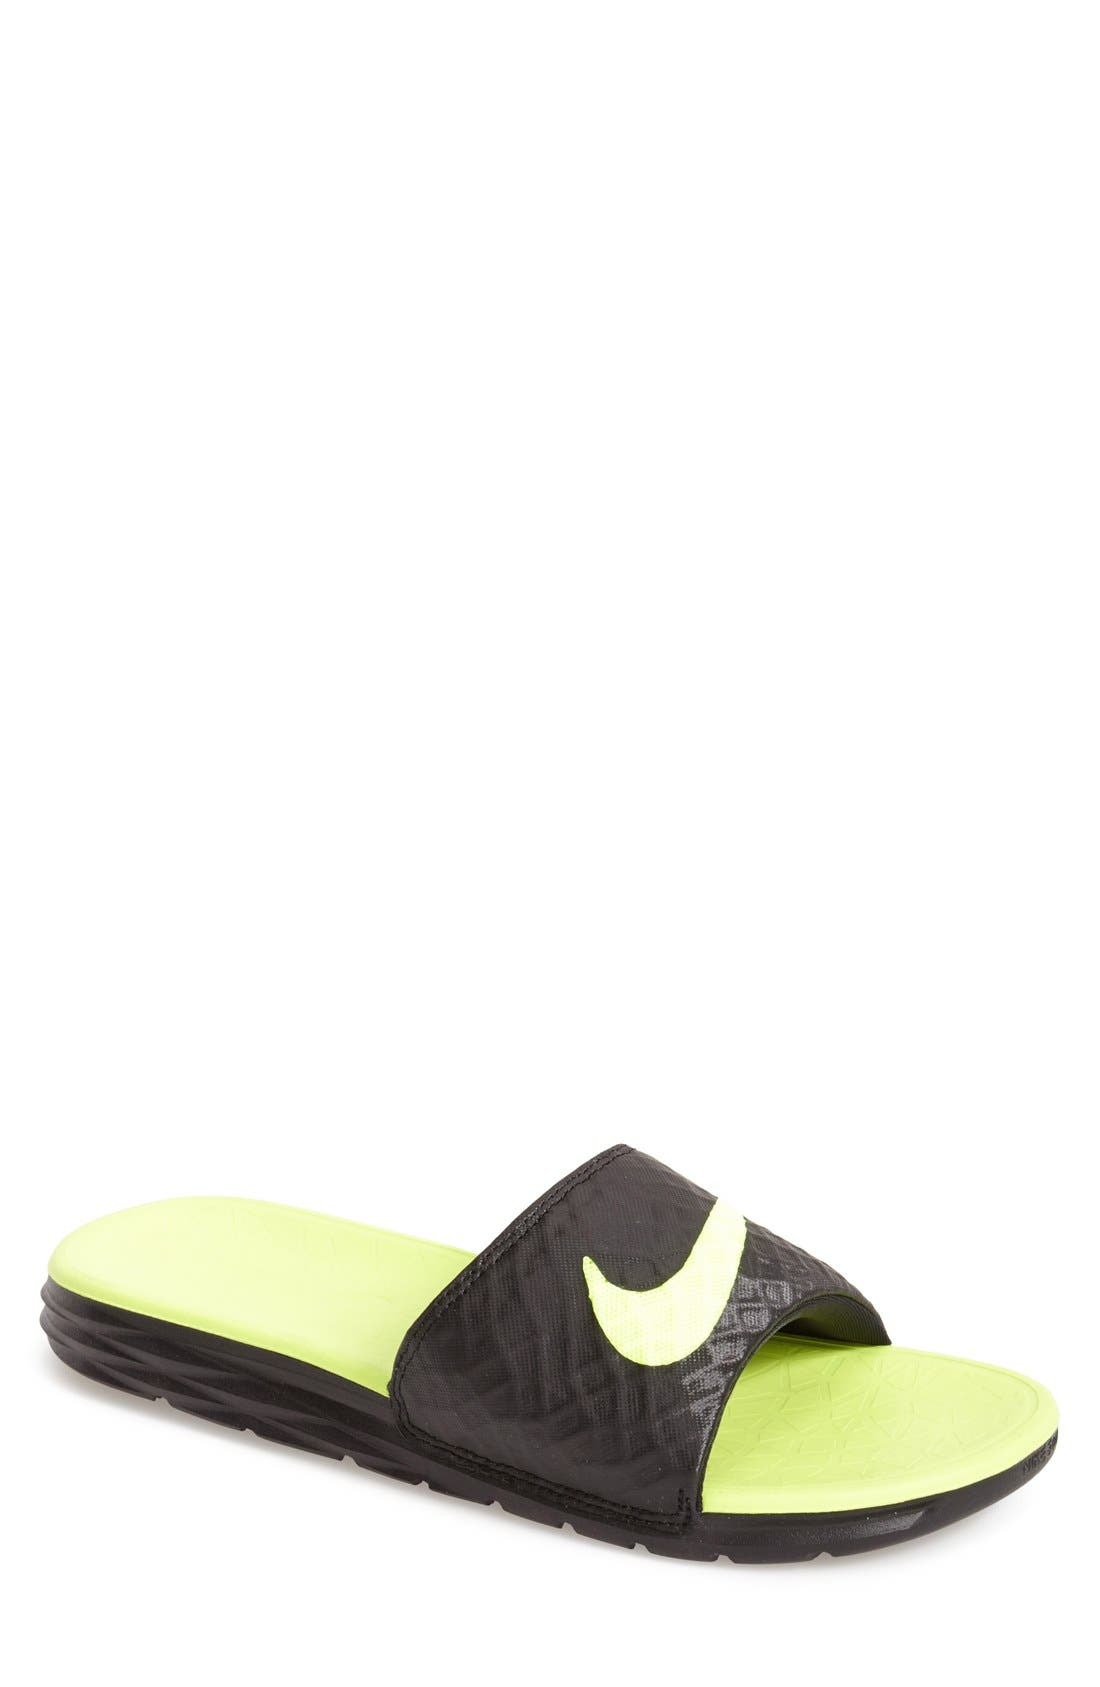 NIKE 'Benassi Solarsoft 2' Slide Sandal, Main, color, 017